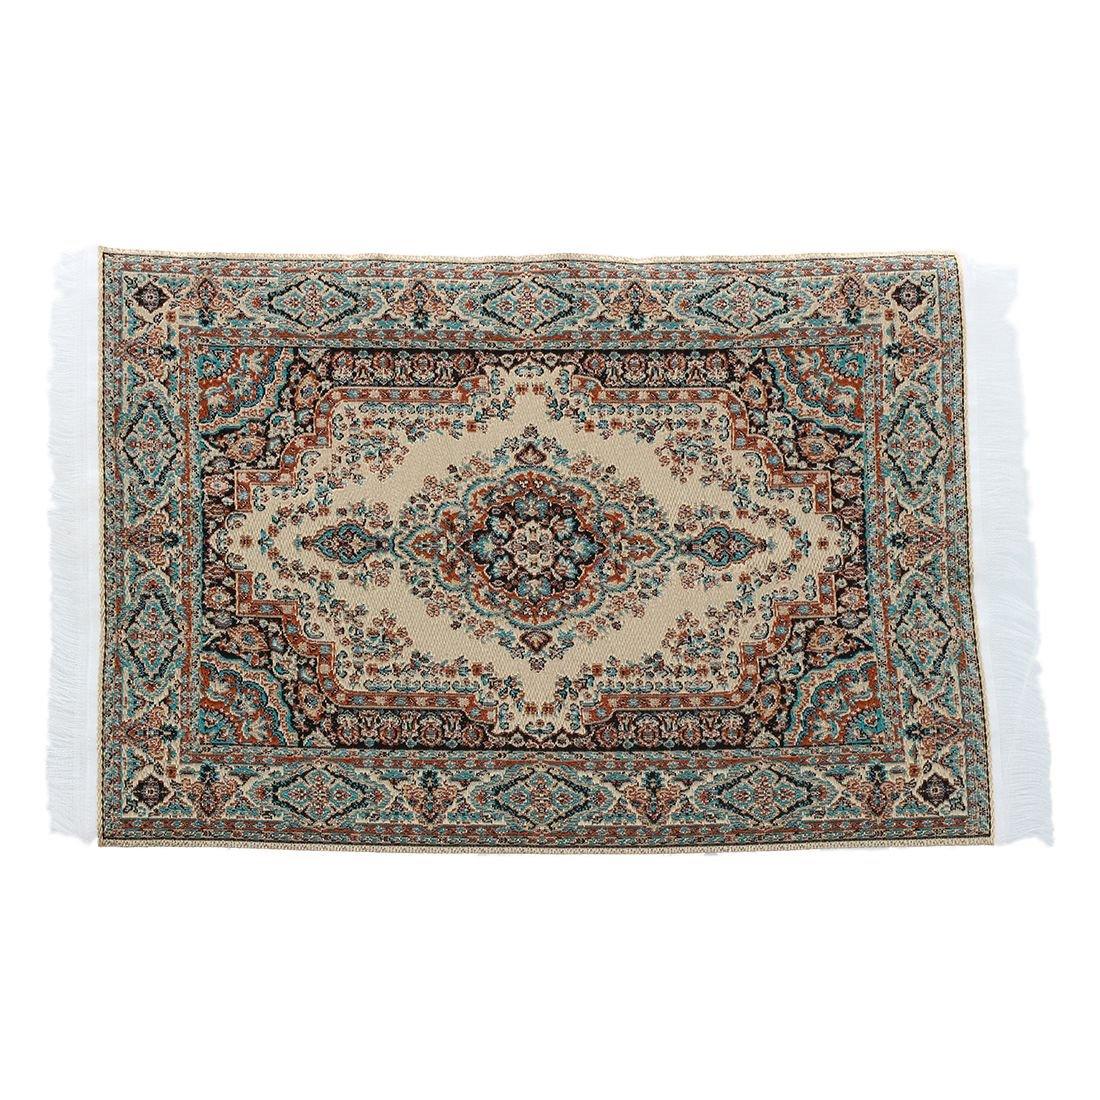 SODIAL(R) 1:12 Dollhouse Miniature Decorative Carpet Interior Modelling 24.2 x 15cm 034980